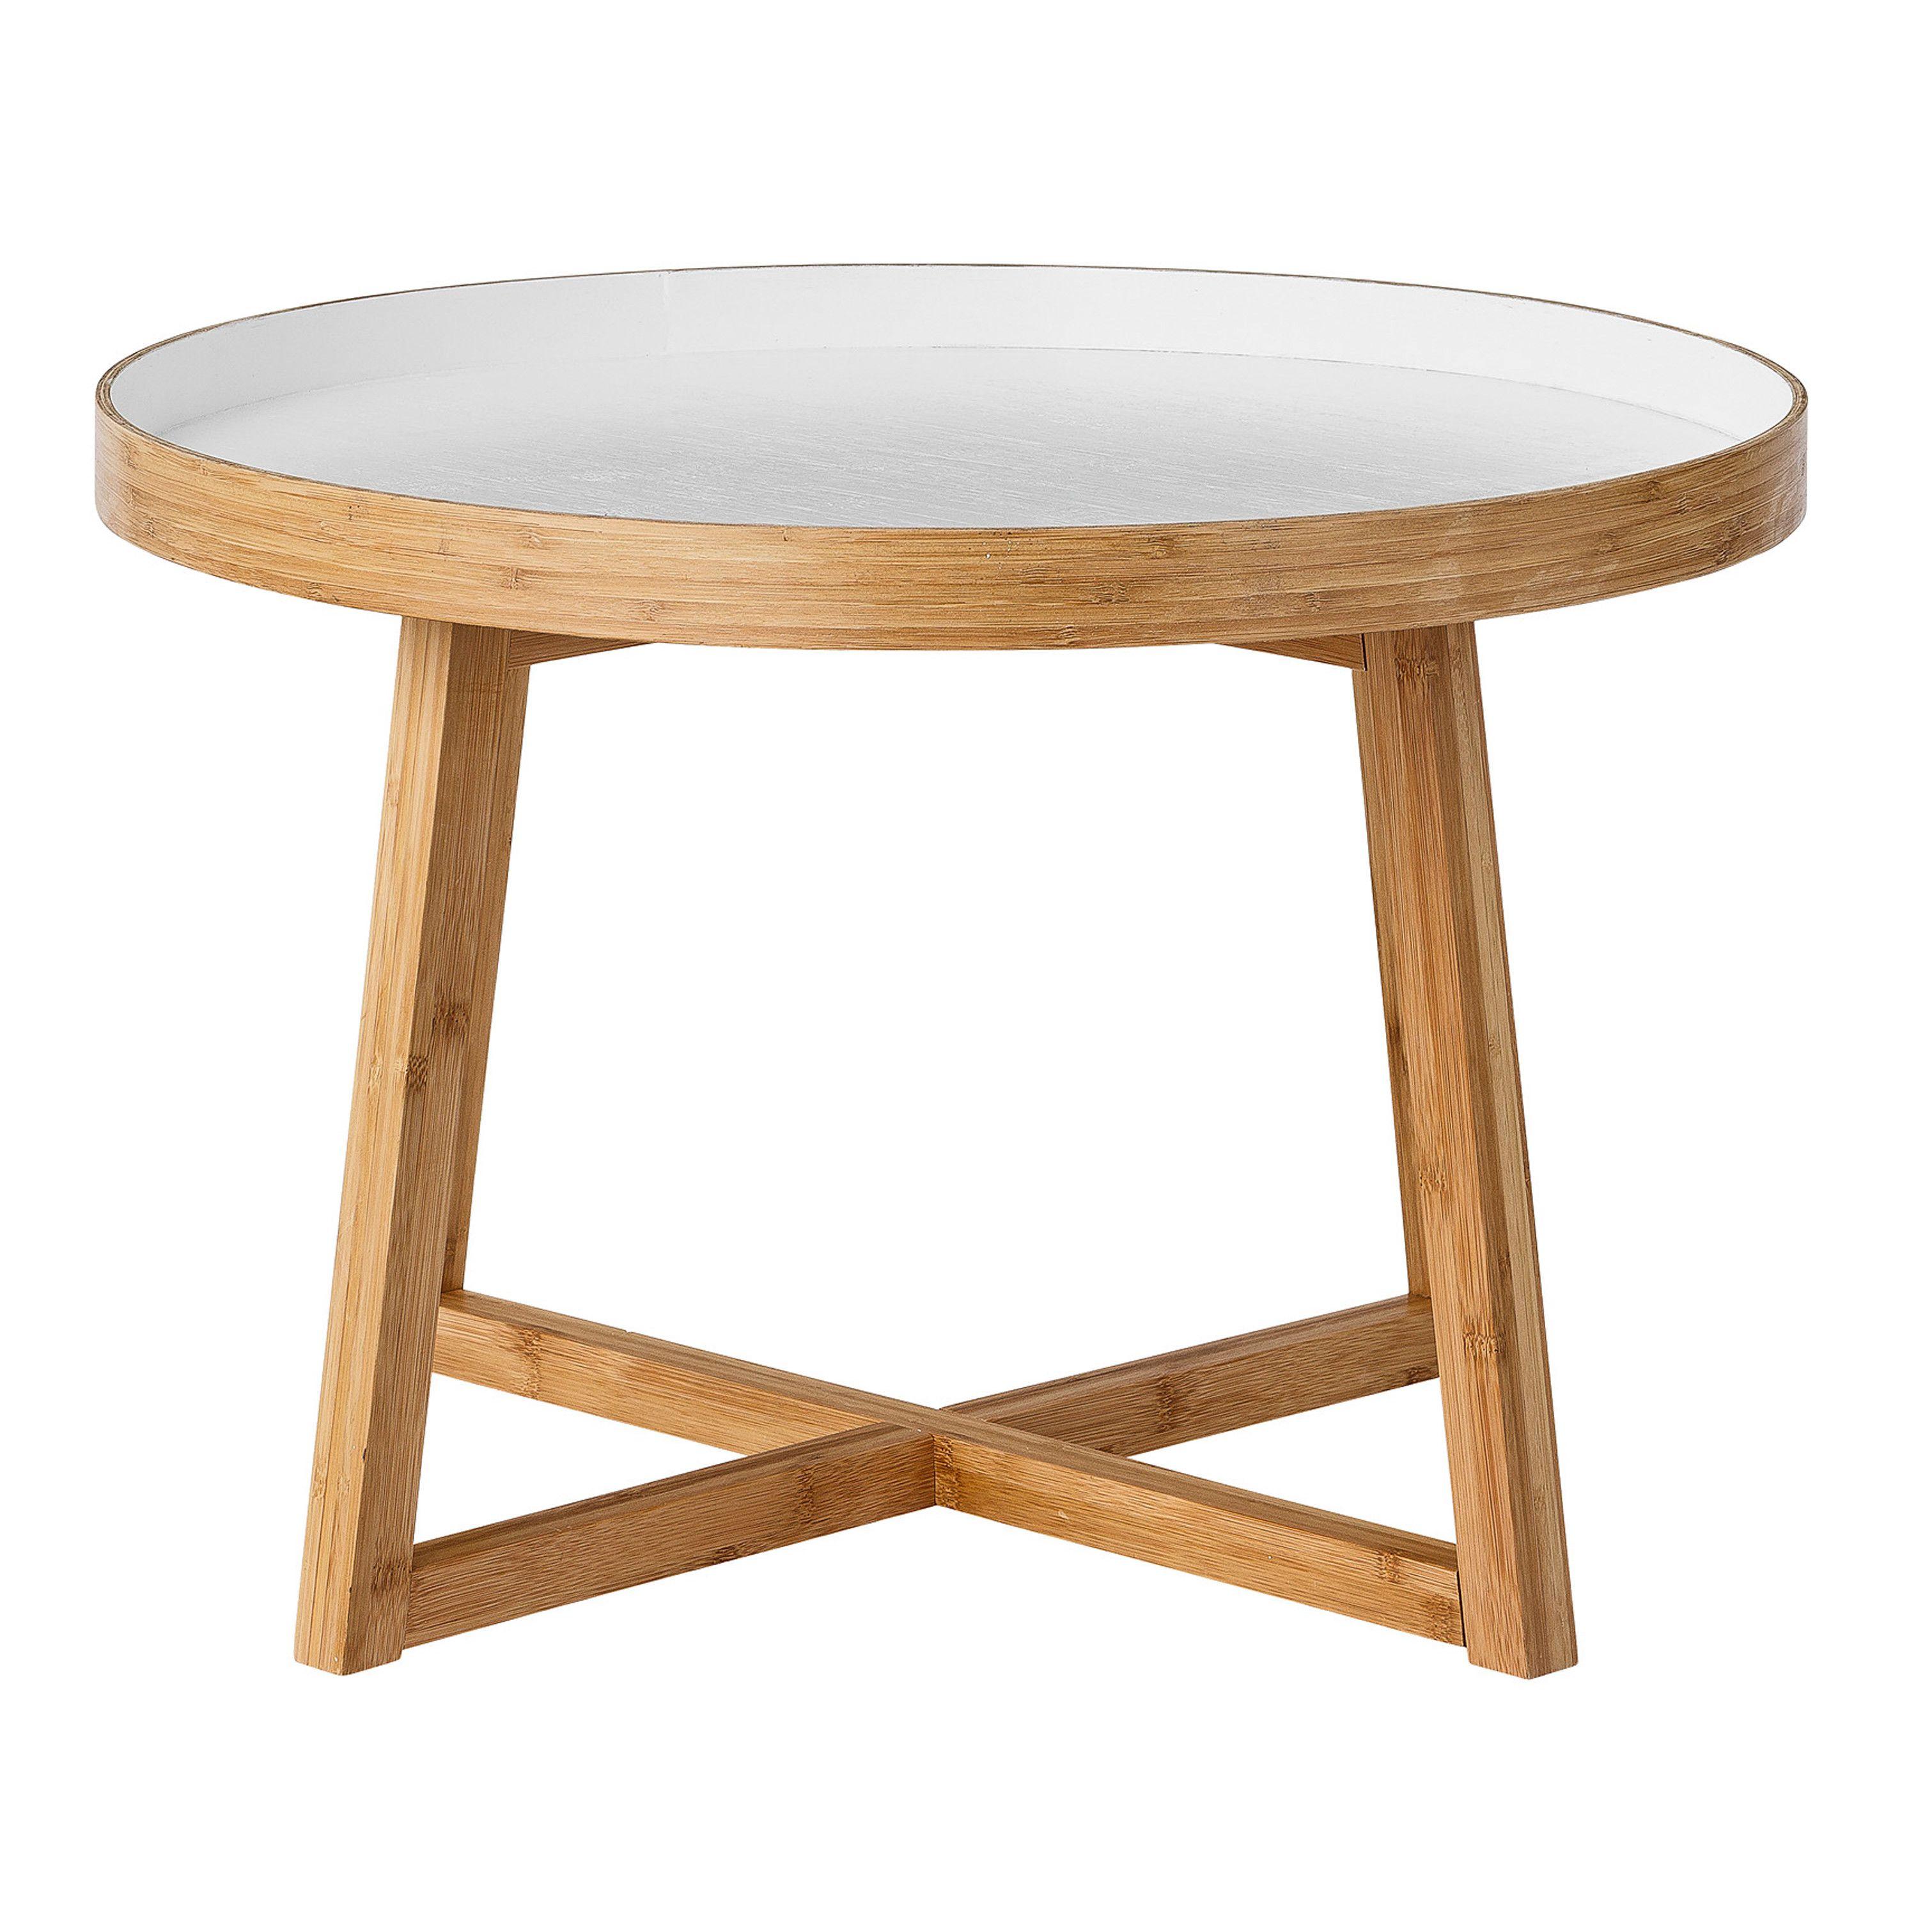 Bloomingville Coffee Table Coffee Table Bamboo Coffee Table Round Coffee Table [ 3022 x 3022 Pixel ]